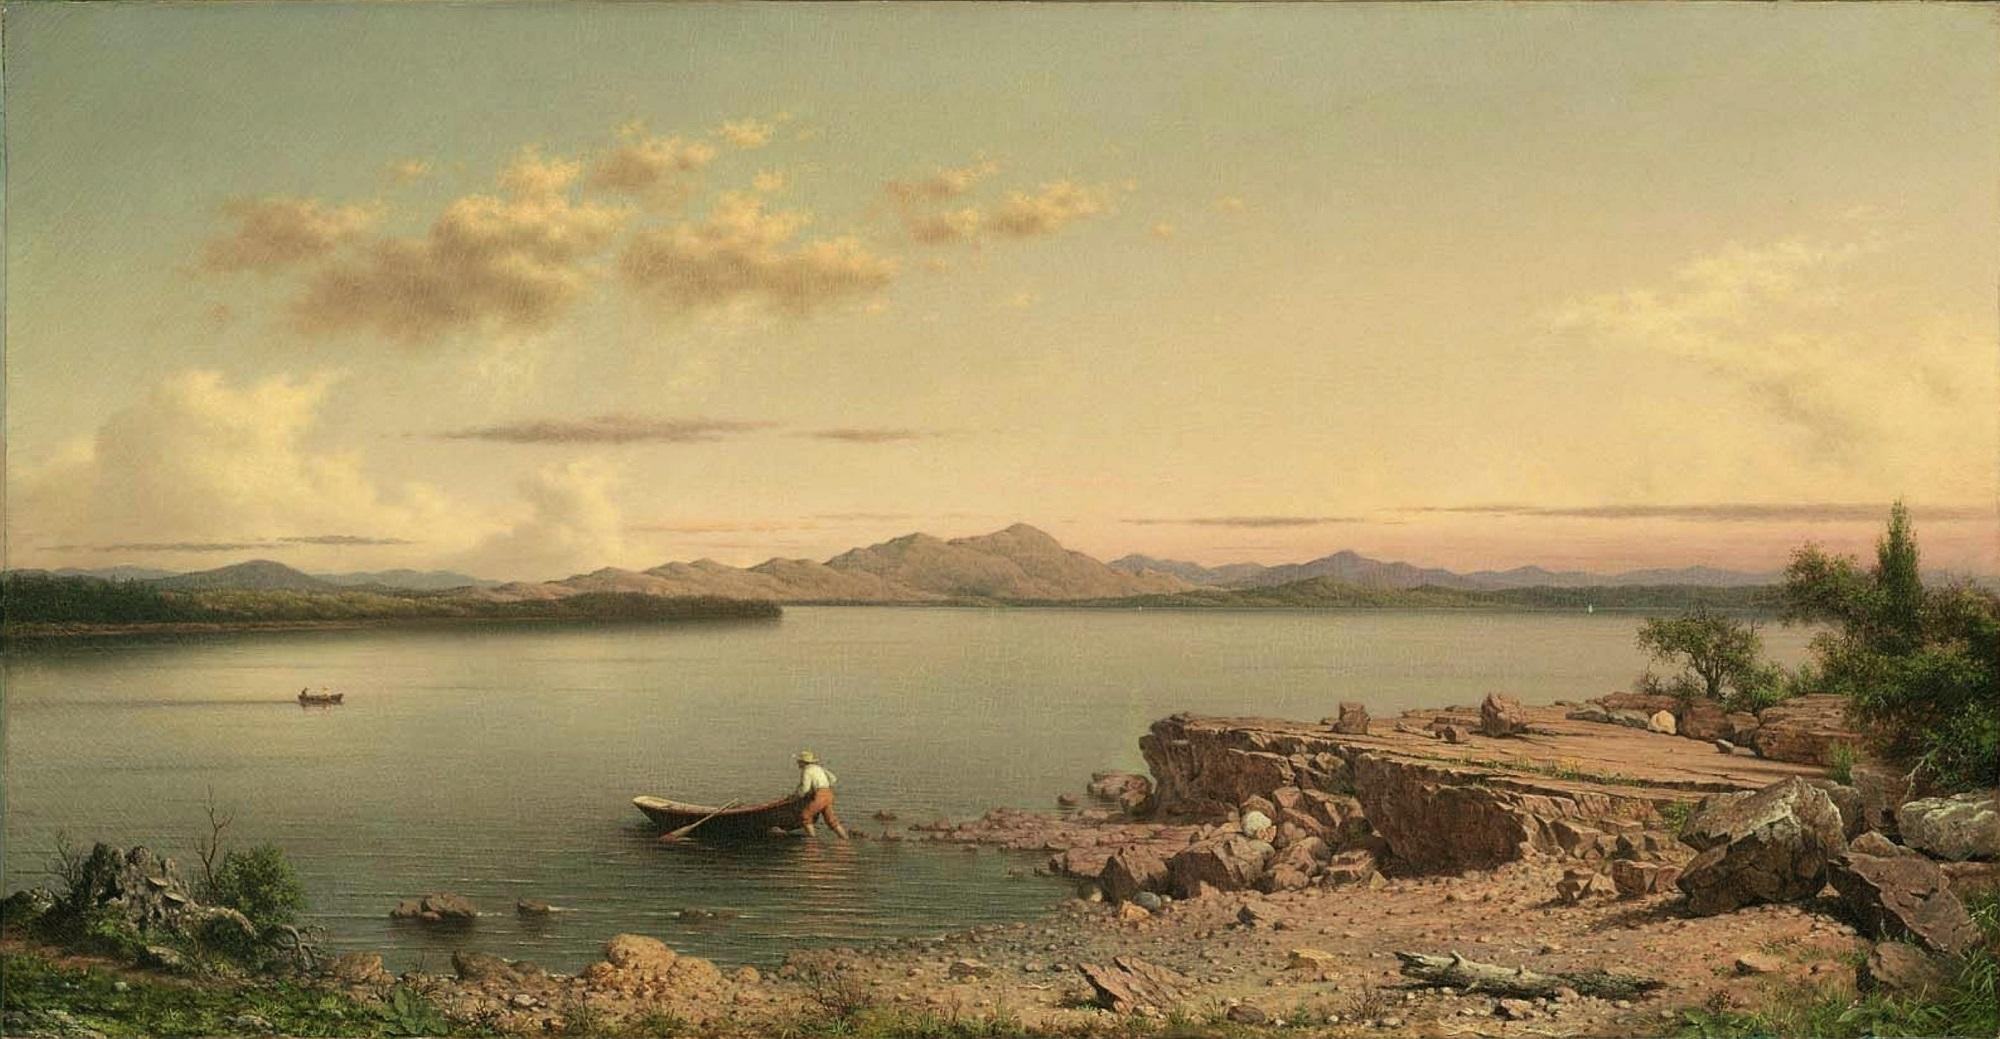 Martin Johnson Heade,  Lake George , 1862, Museum of Fine Arts, Boston.